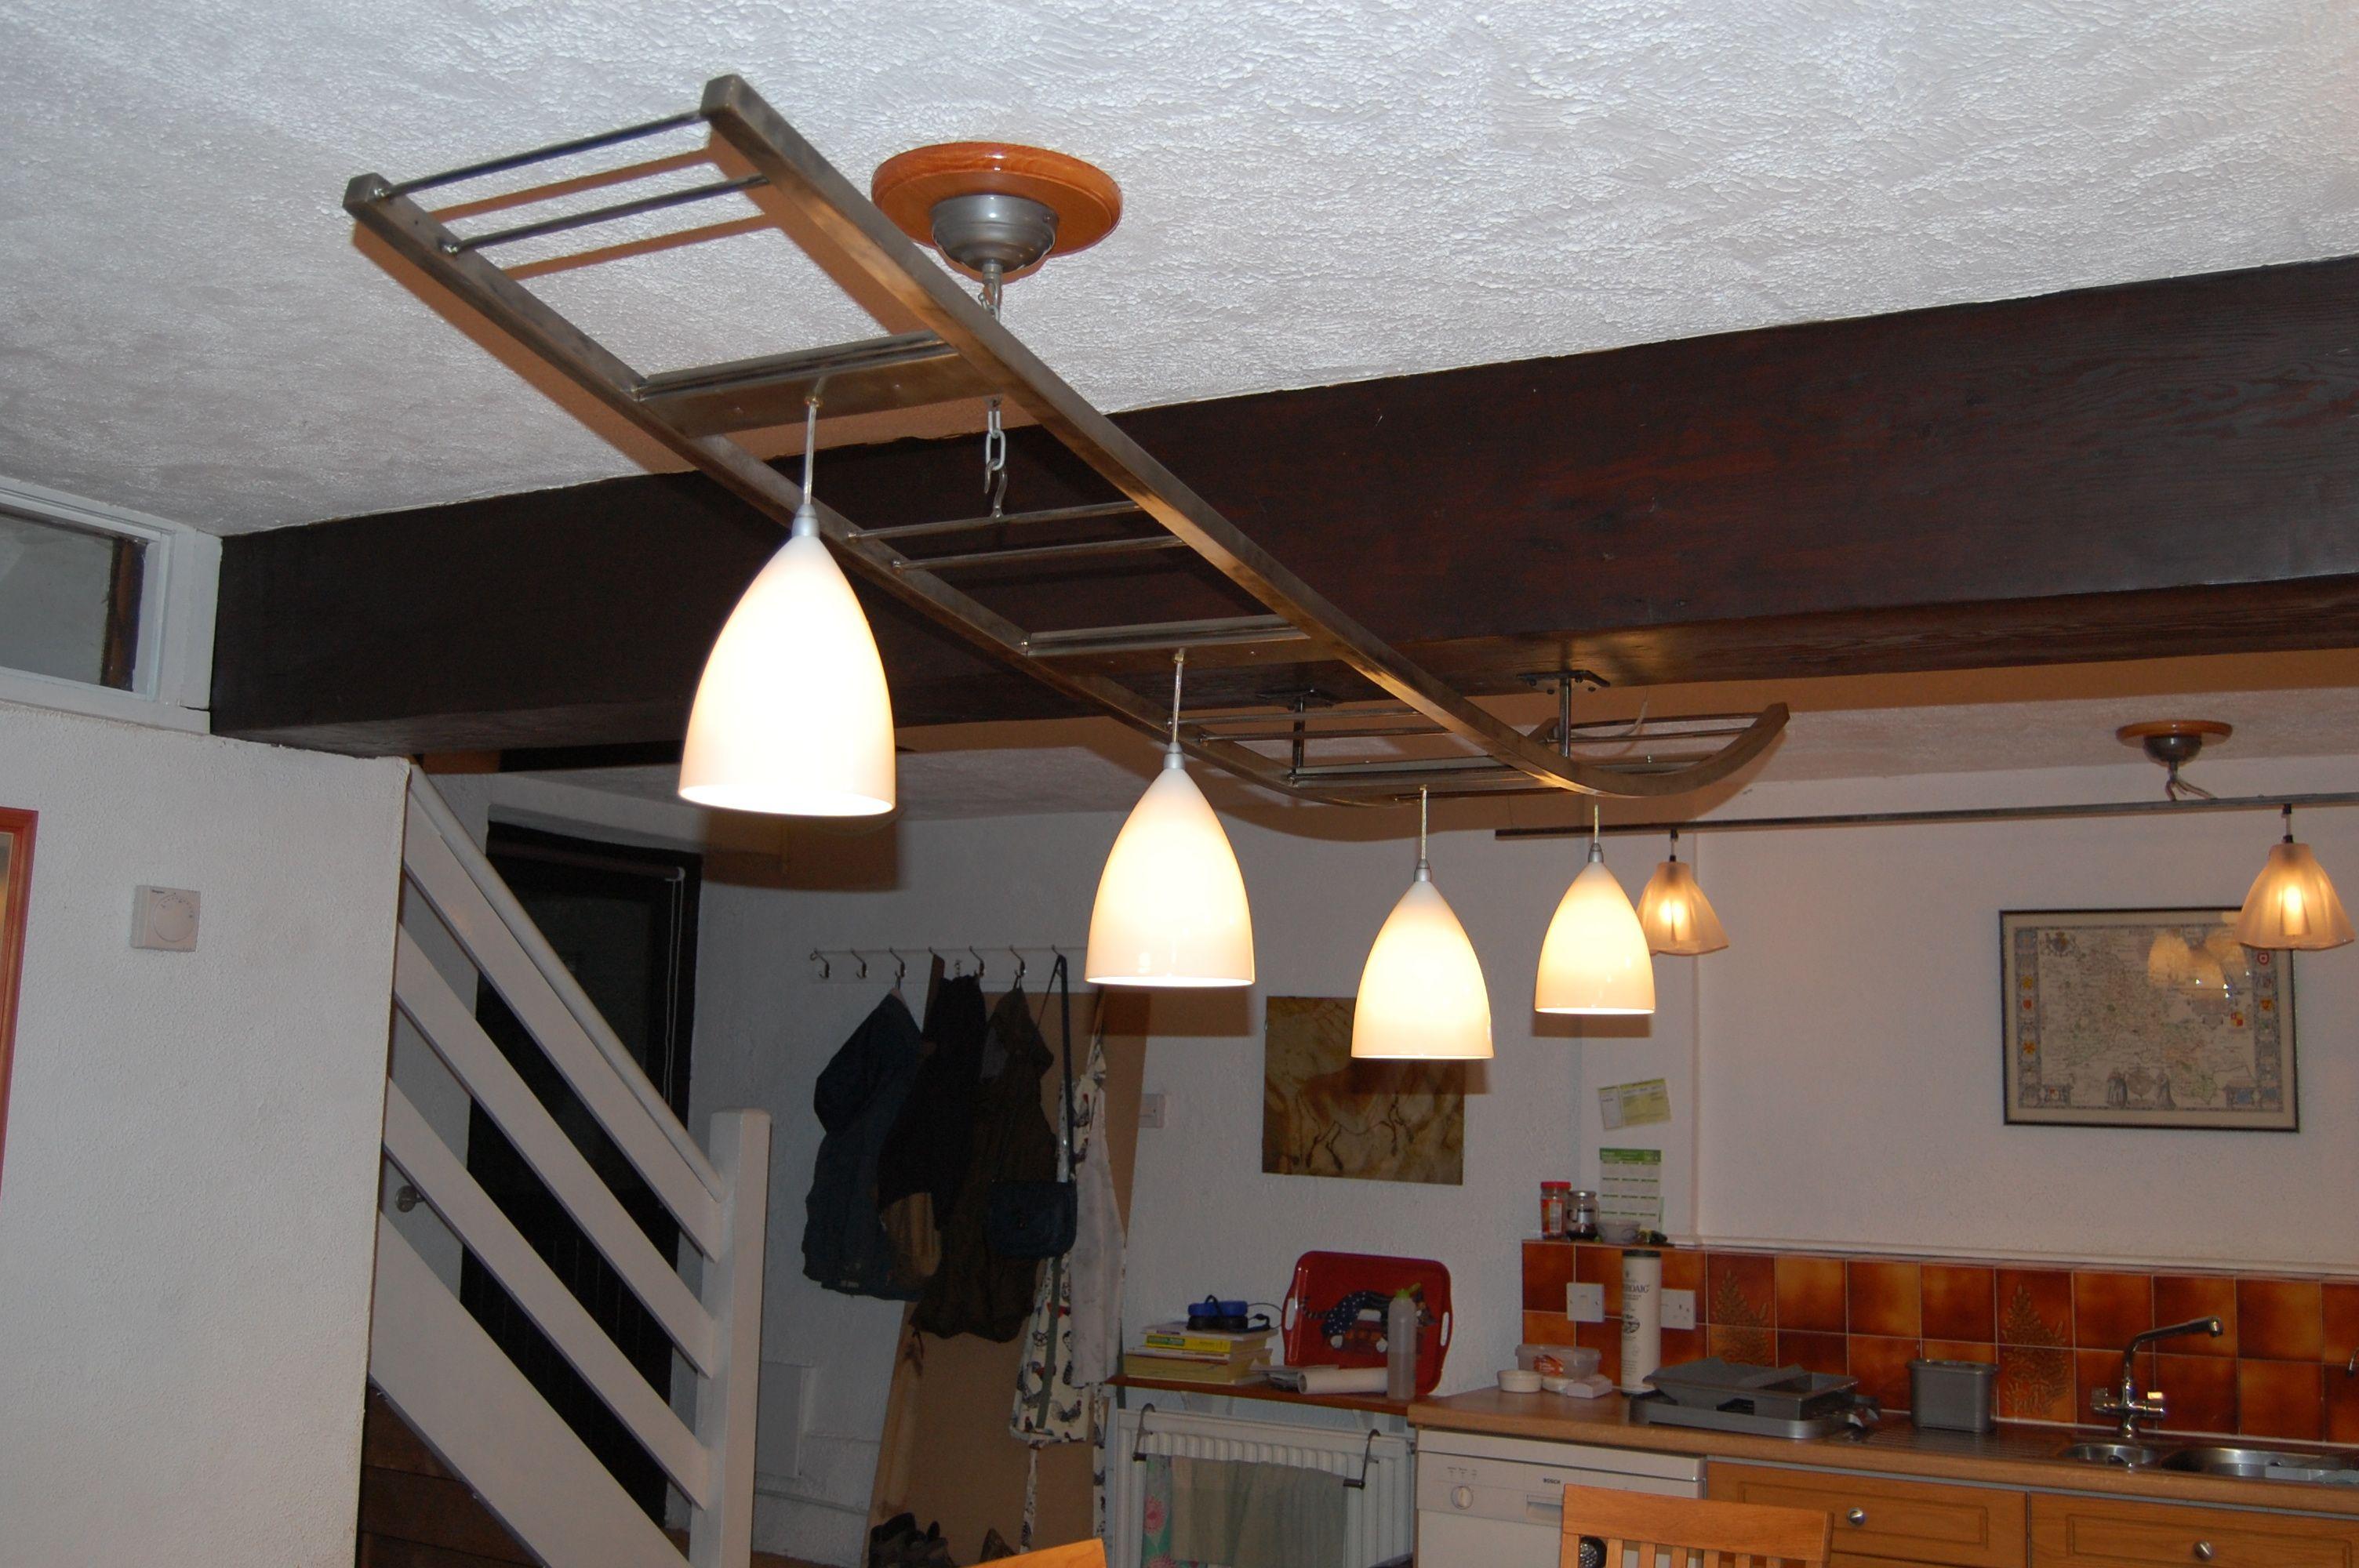 Exhibition lighting Dorchester Arts an example of bining a zero